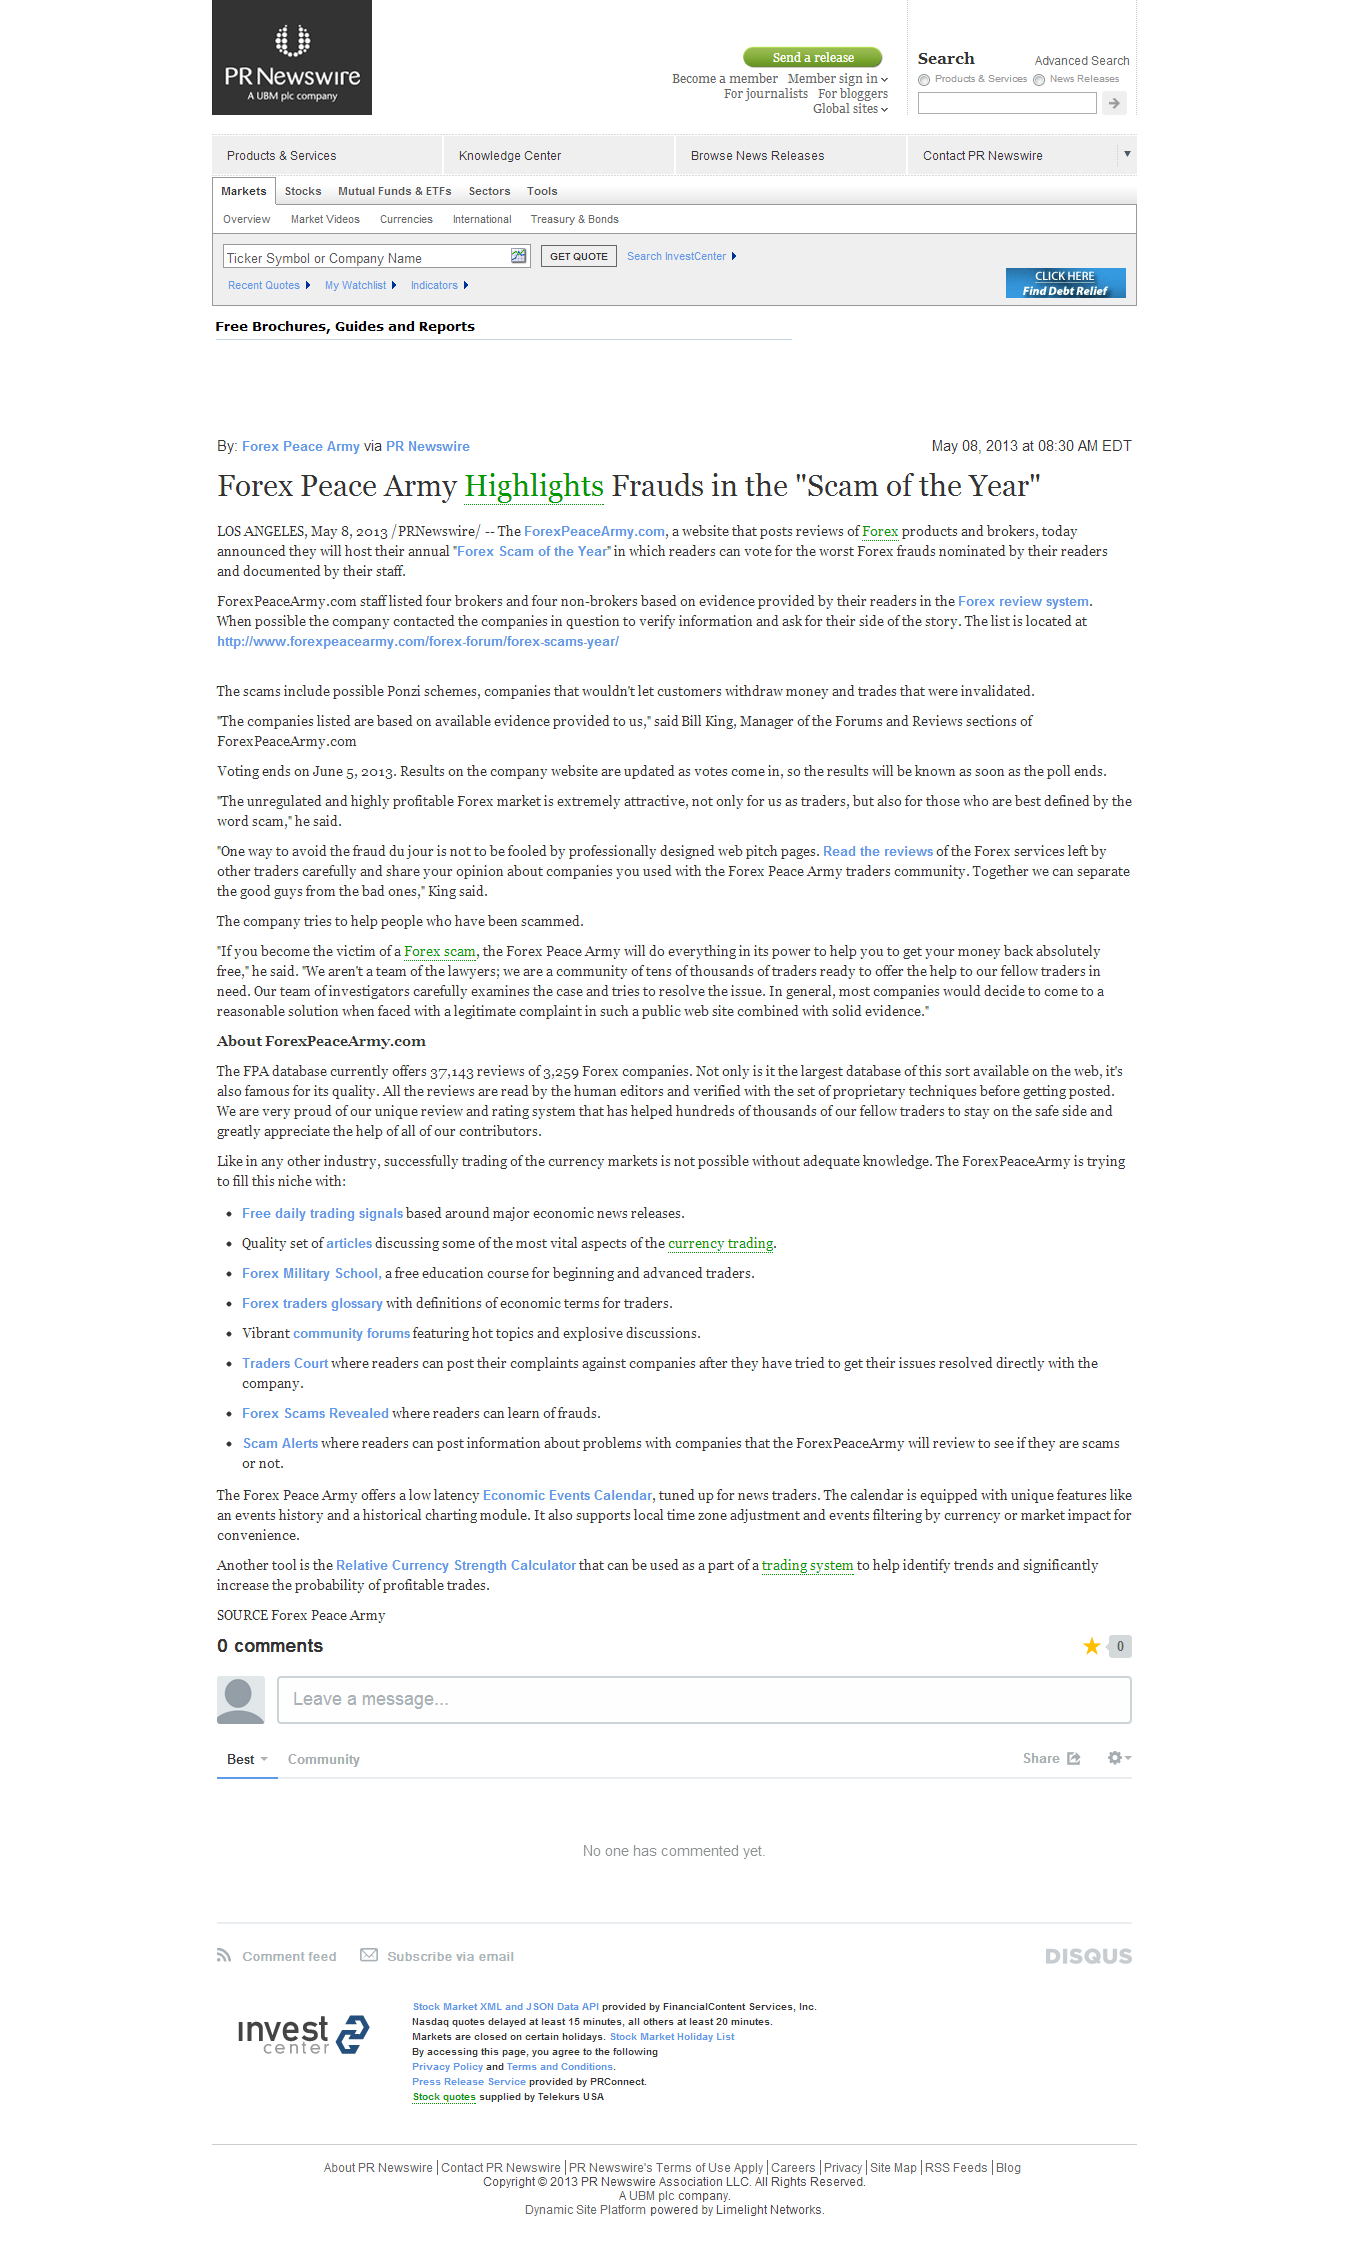 Forex Peace Army   FinancialContent – PR Newswire